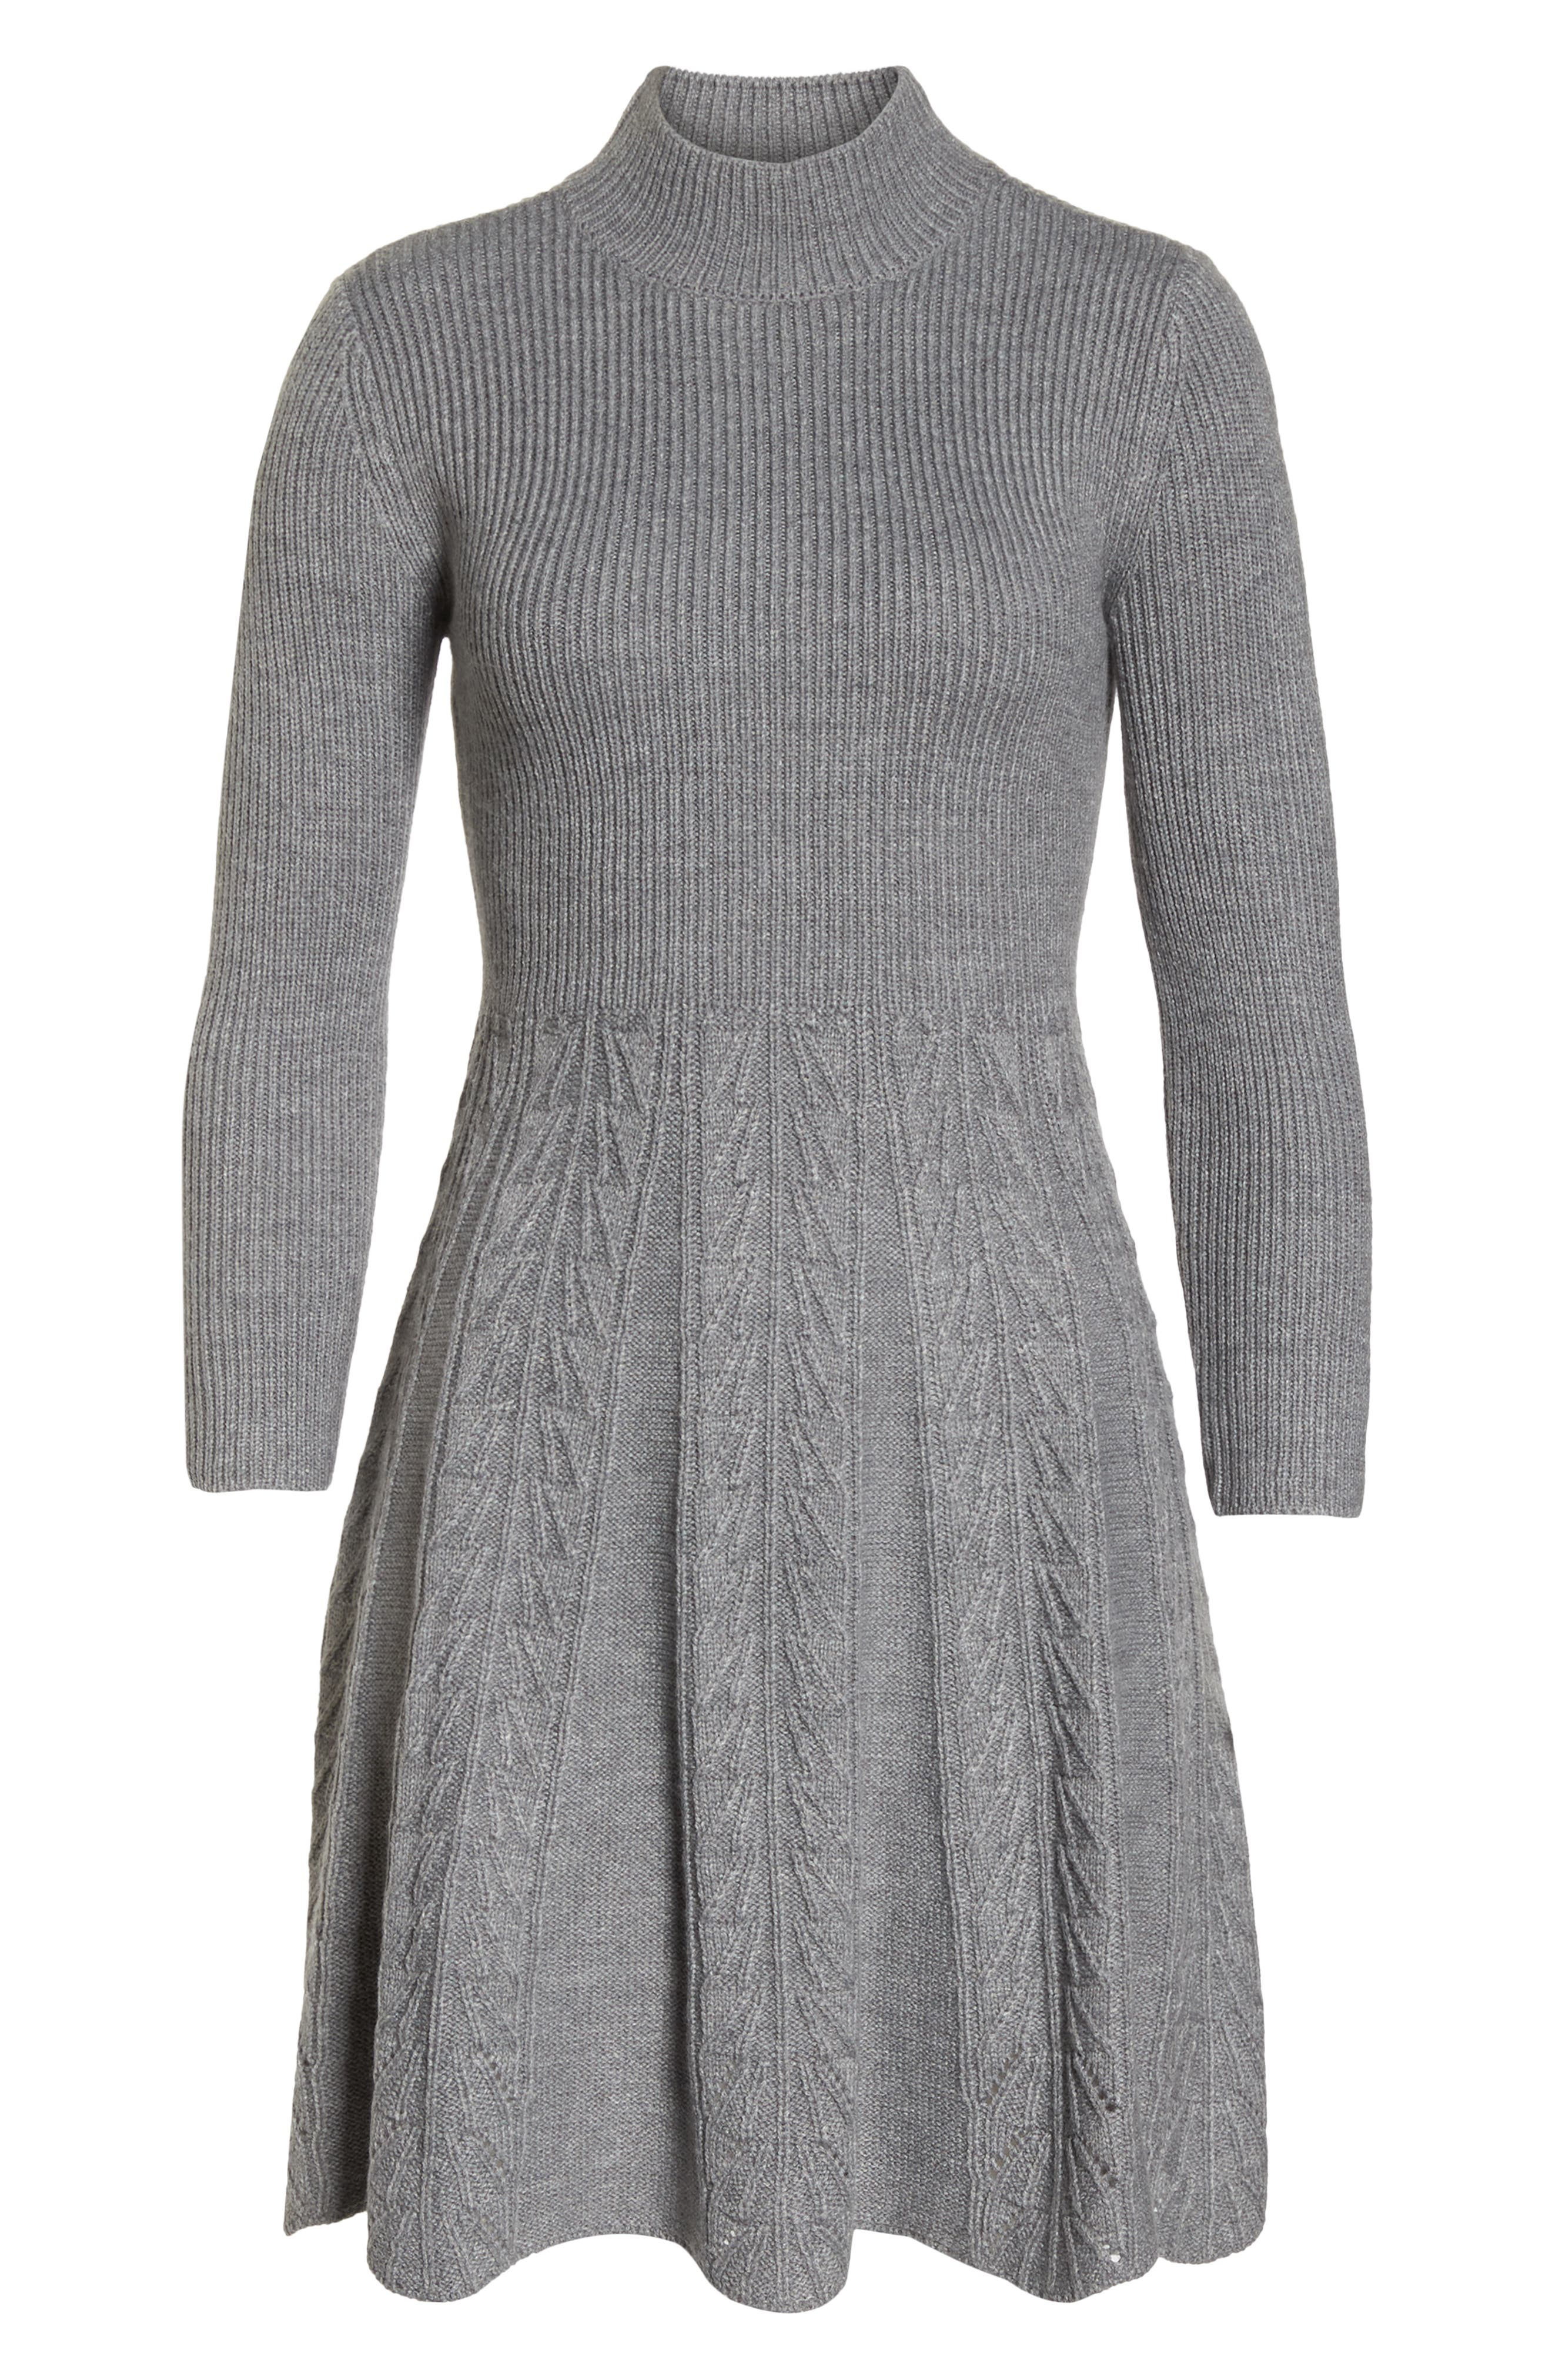 ELIZA J, Mock Neck Fit & Flare Sweater Dress, Alternate thumbnail 7, color, 030